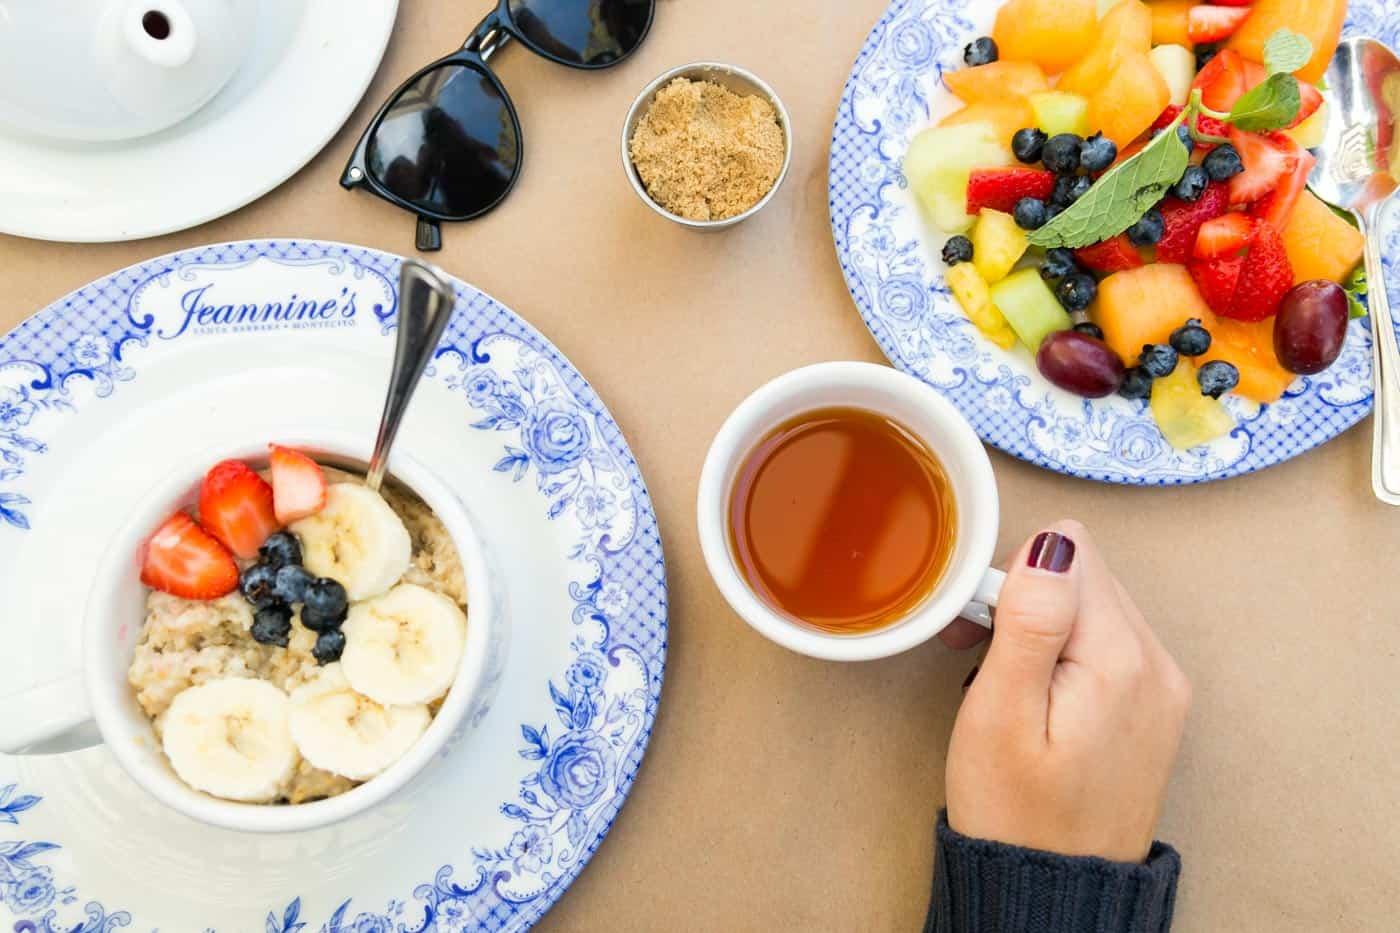 California breakfast, Jeannine's in Santa Barbara, Travel Guide - My Style Vita @mystylevita